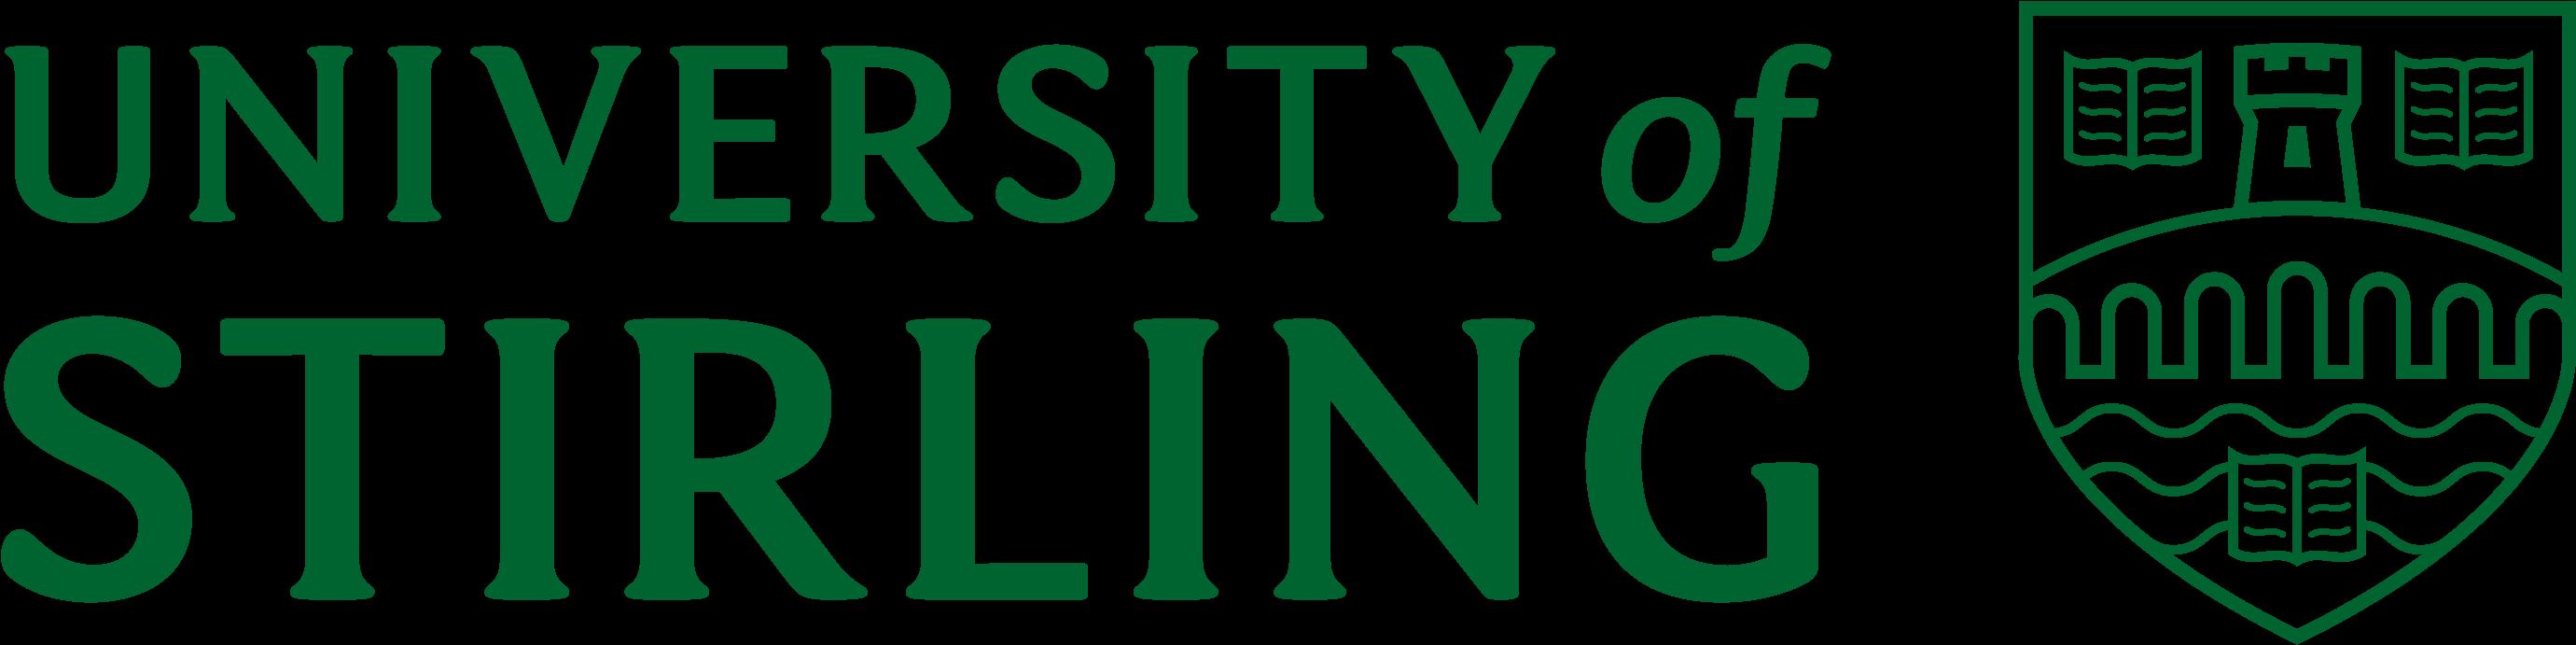 461-4619625_university-of-stirling-logo